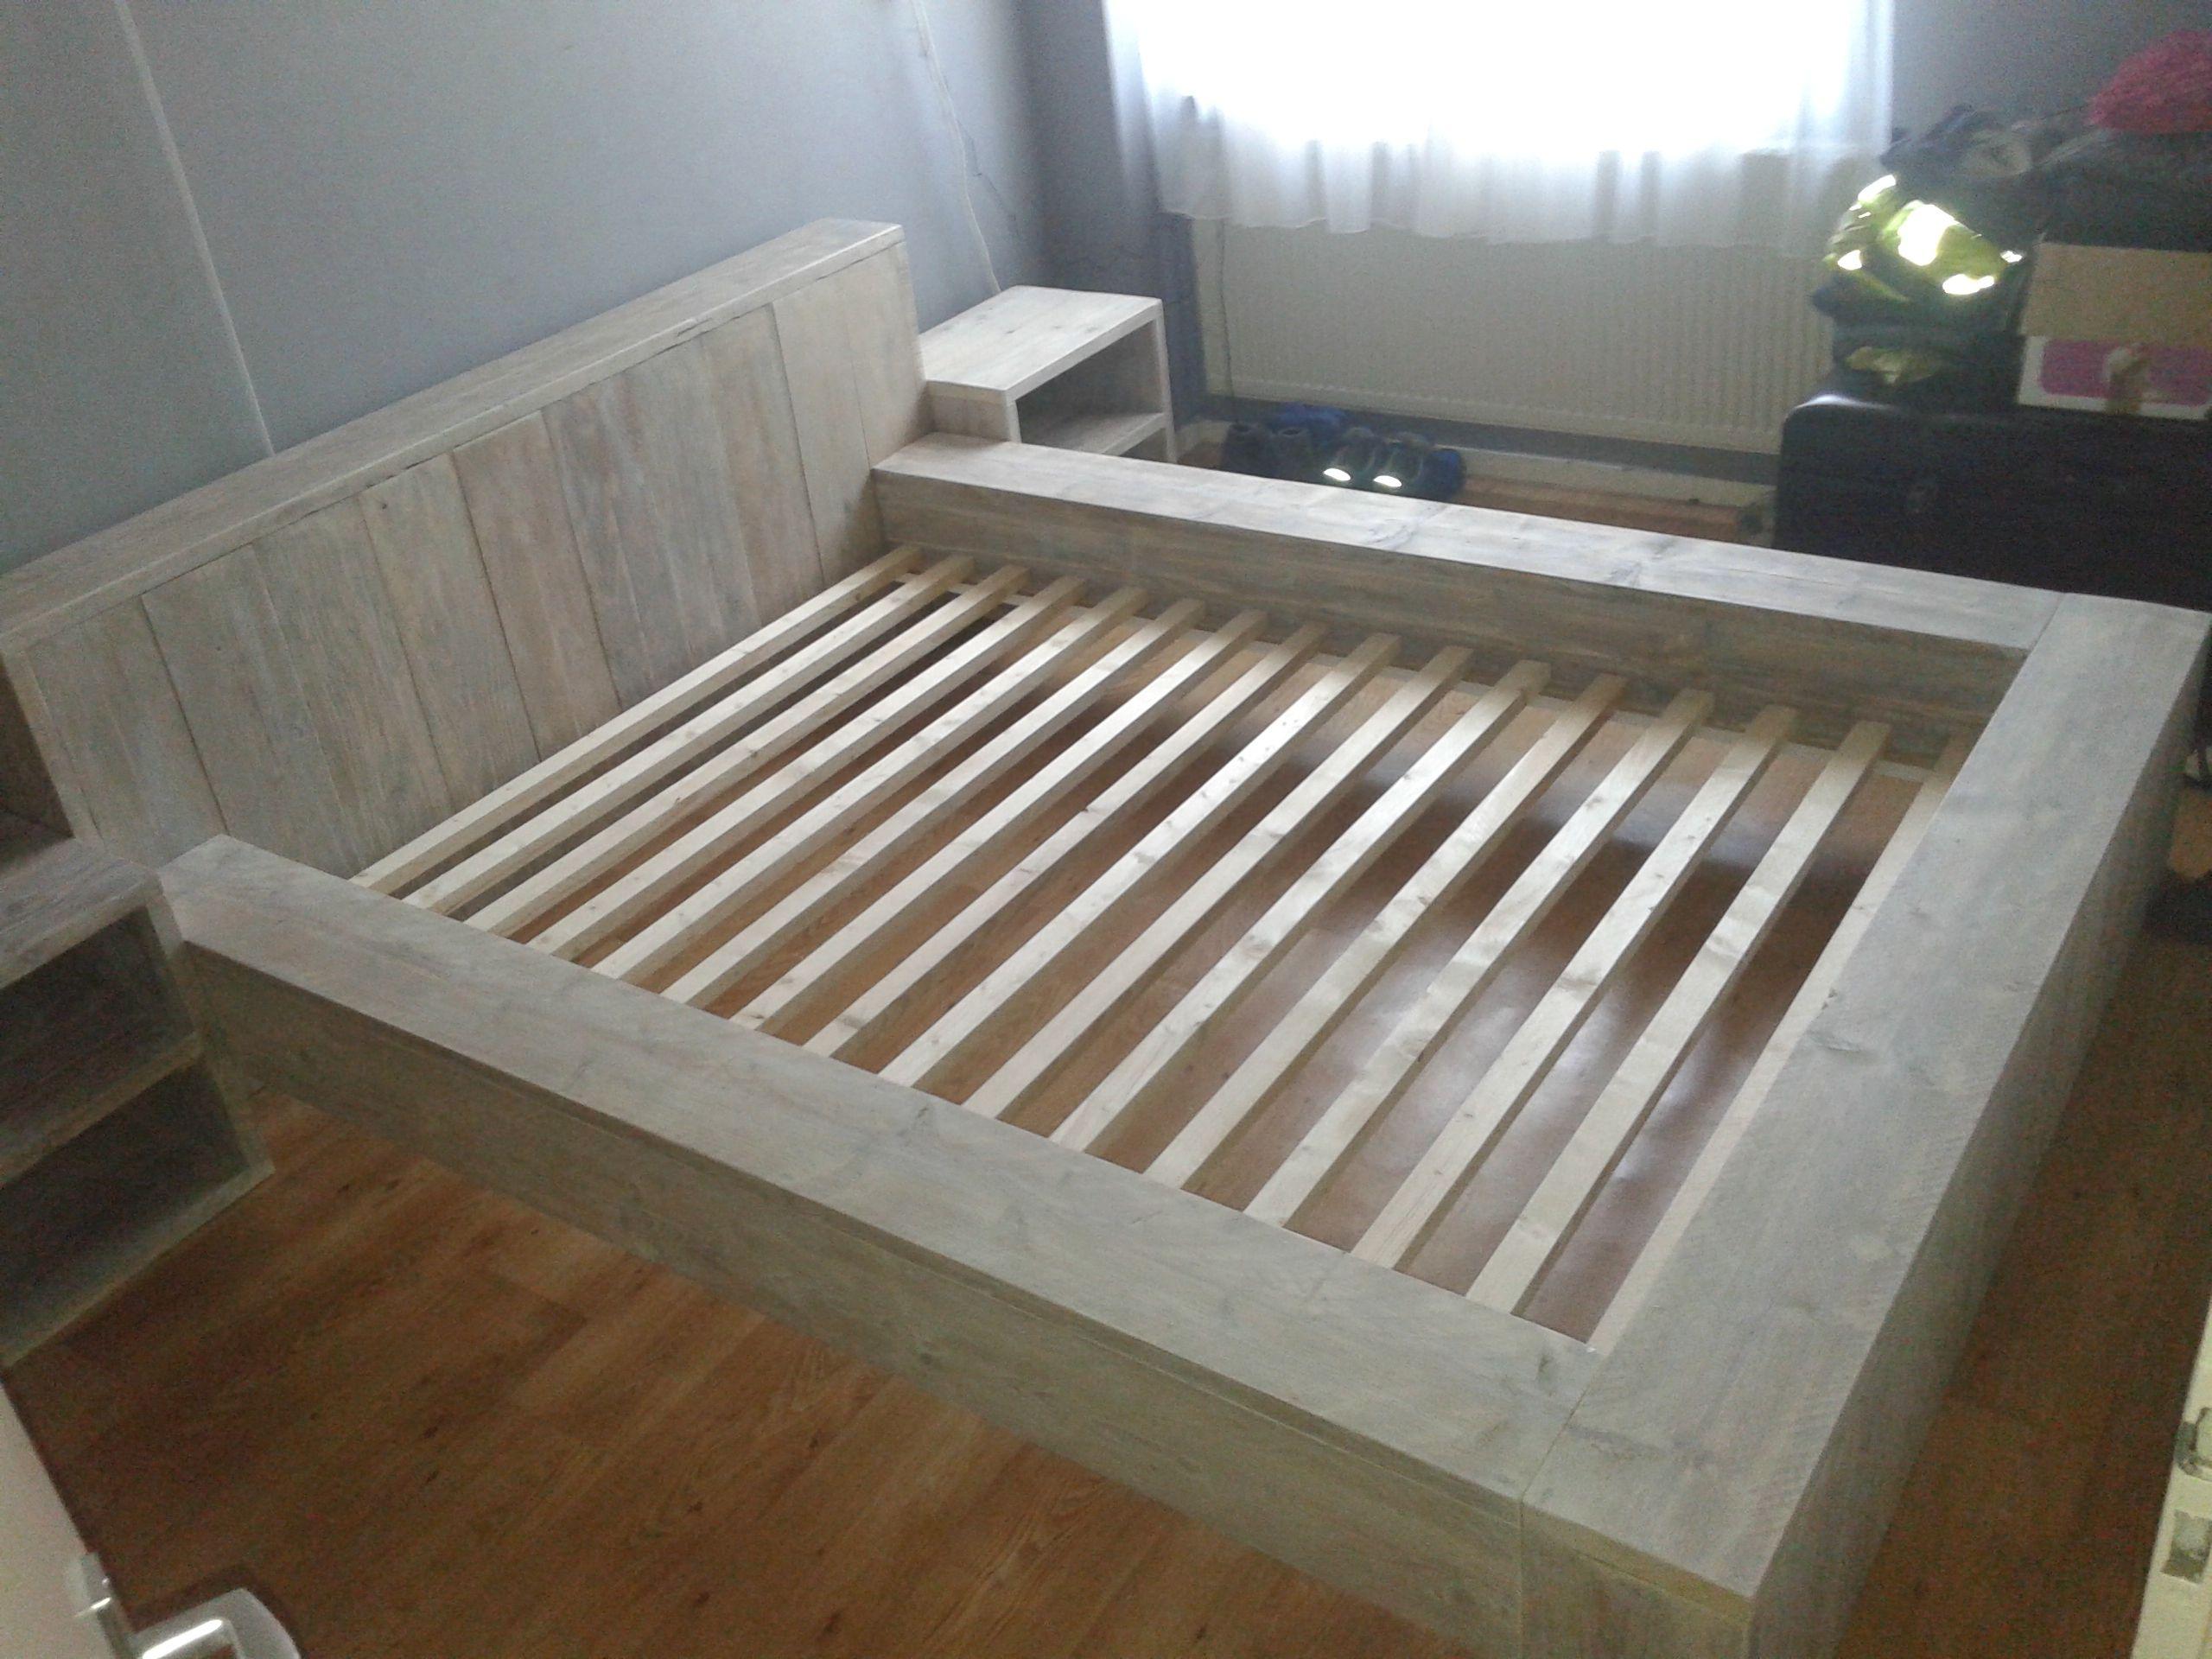 robuust bed 140x200 cm van gebruikt steigerhout in white. Black Bedroom Furniture Sets. Home Design Ideas